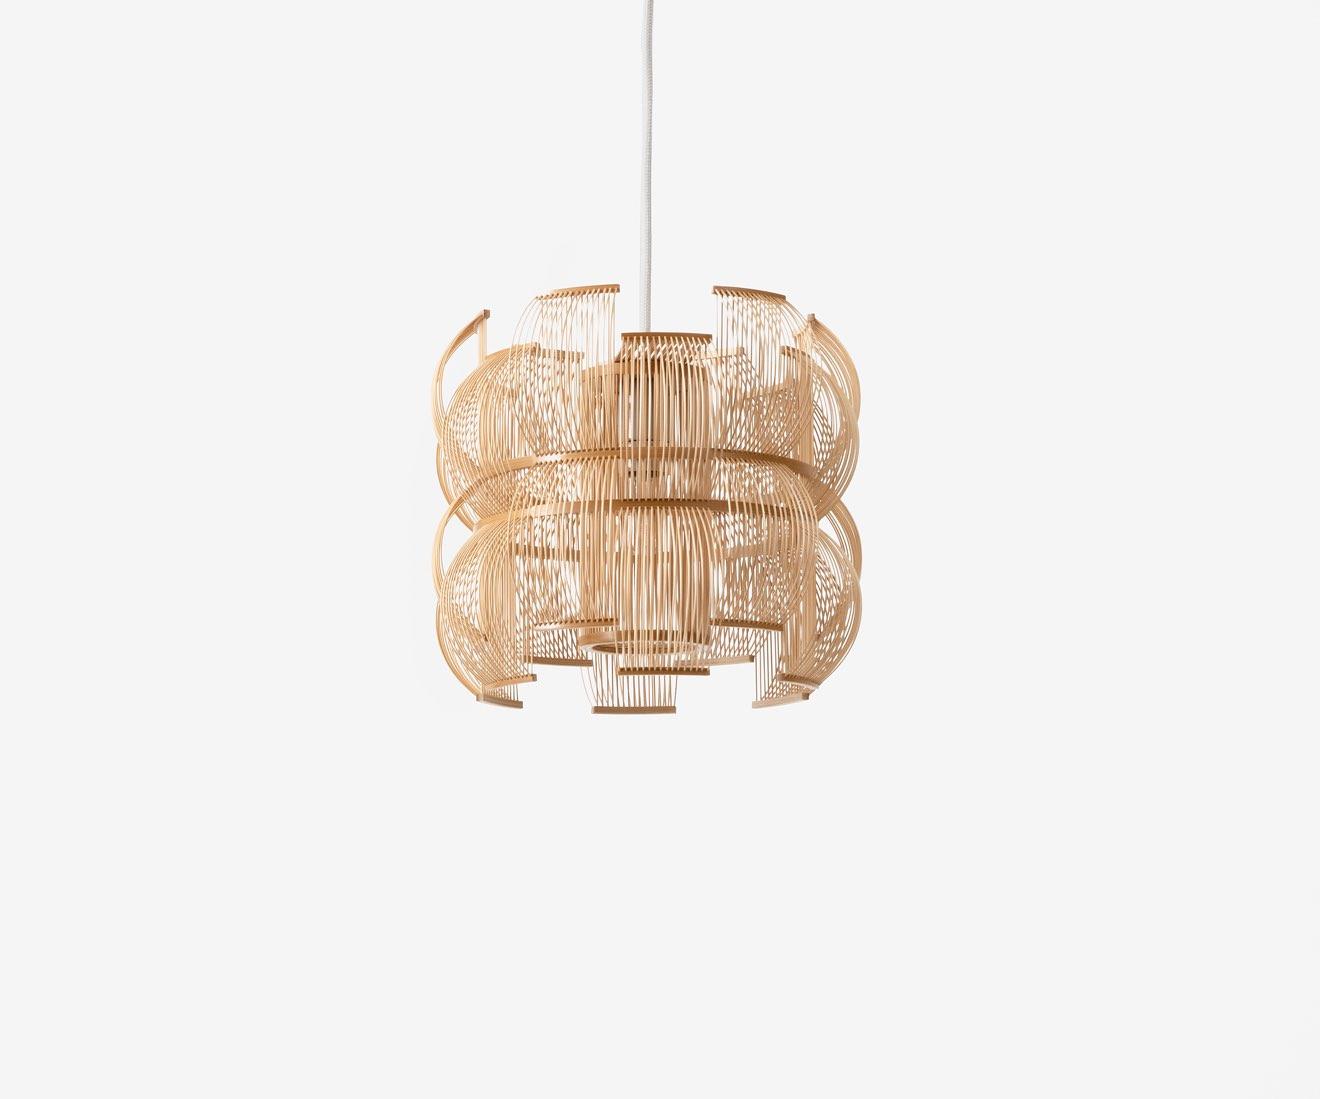 Motarasu Product - SEN pendant lamp by Tani Toshiyuki